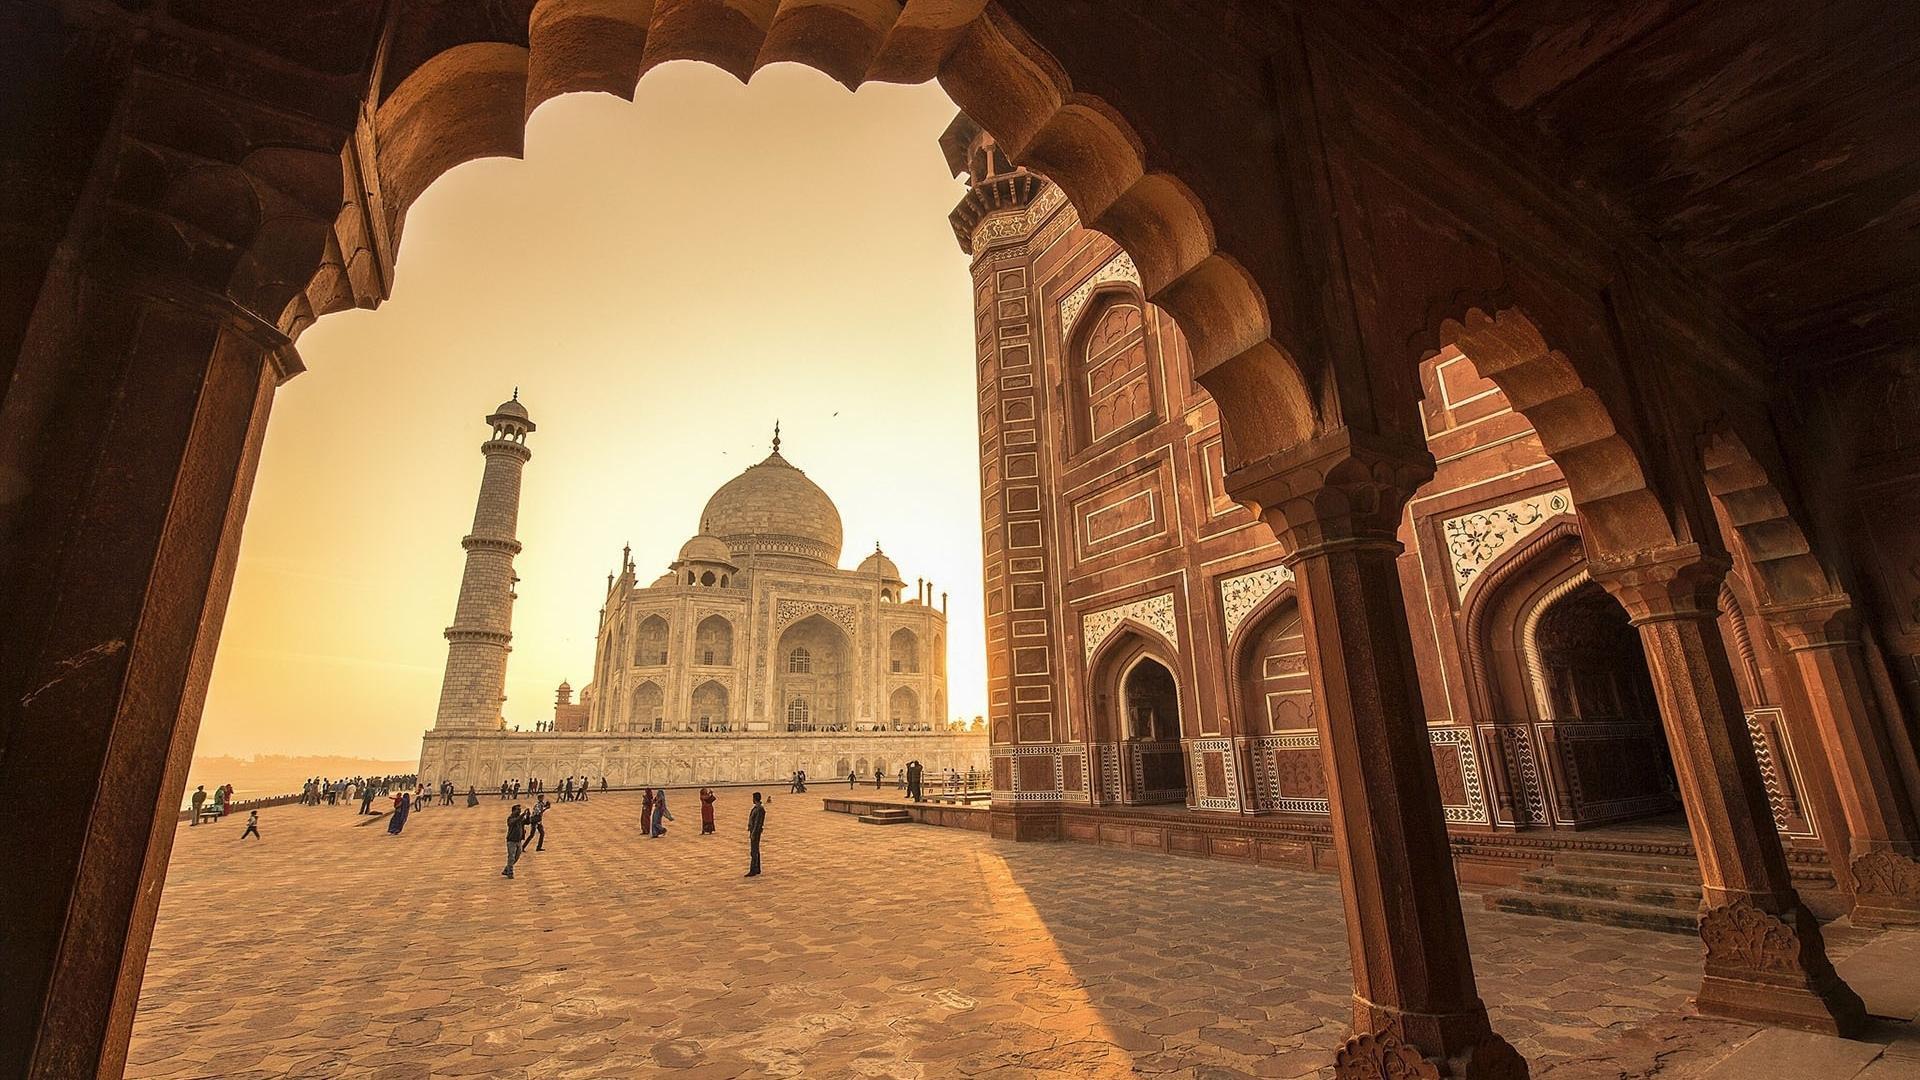 Taj Mahal Pictures